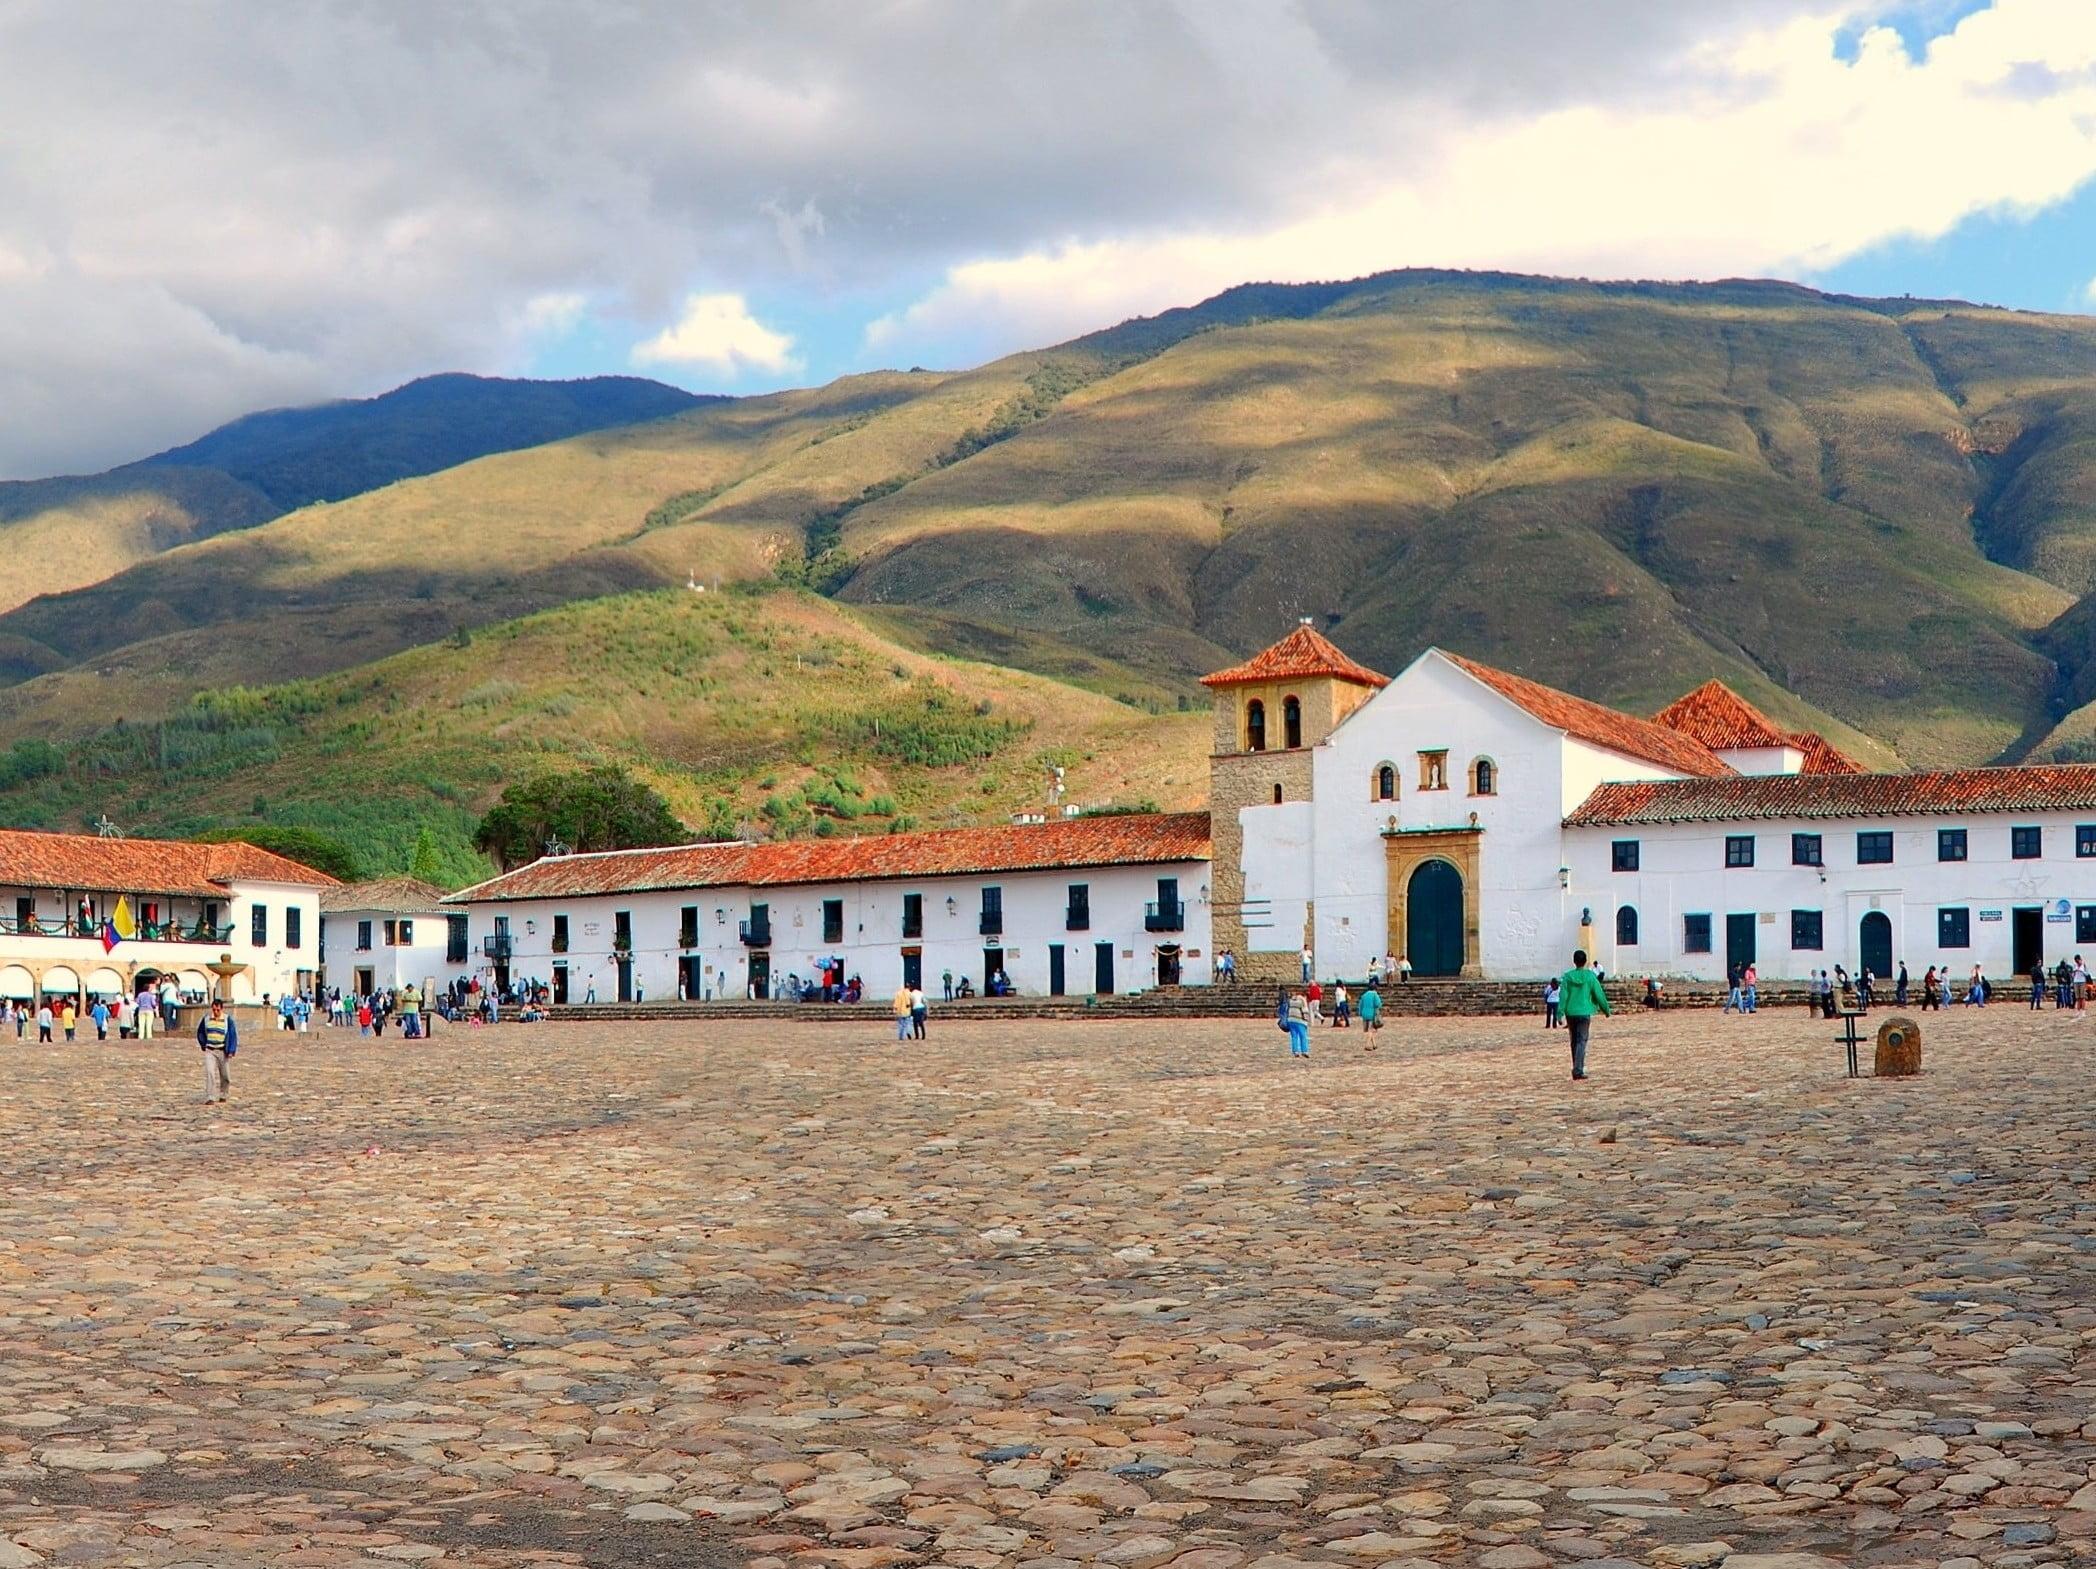 Boyacá Colonial-Plaza central